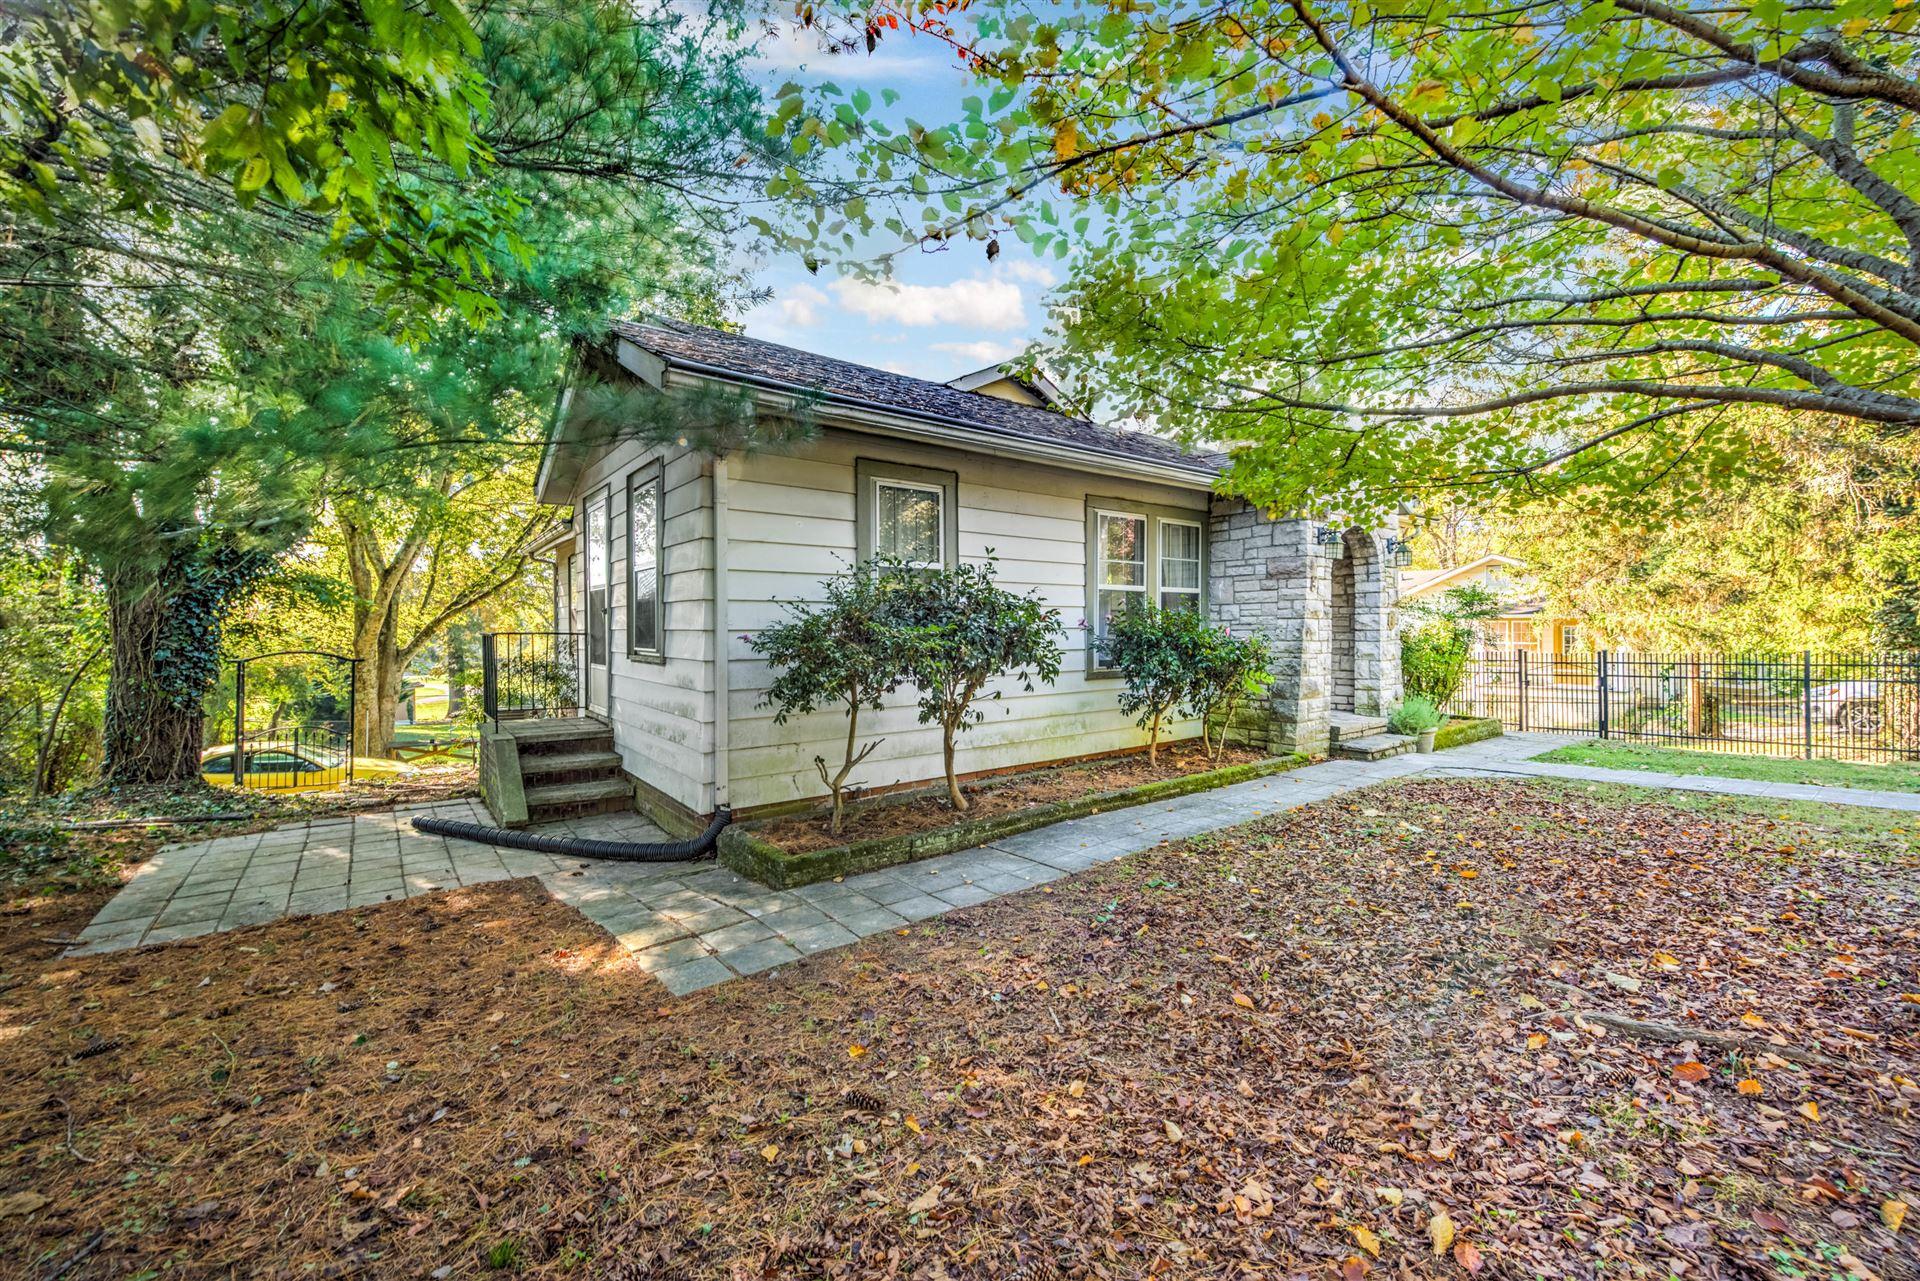 Photo of 108 NE Tansy Lane, Knoxville, TN 37918 (MLS # 1133337)